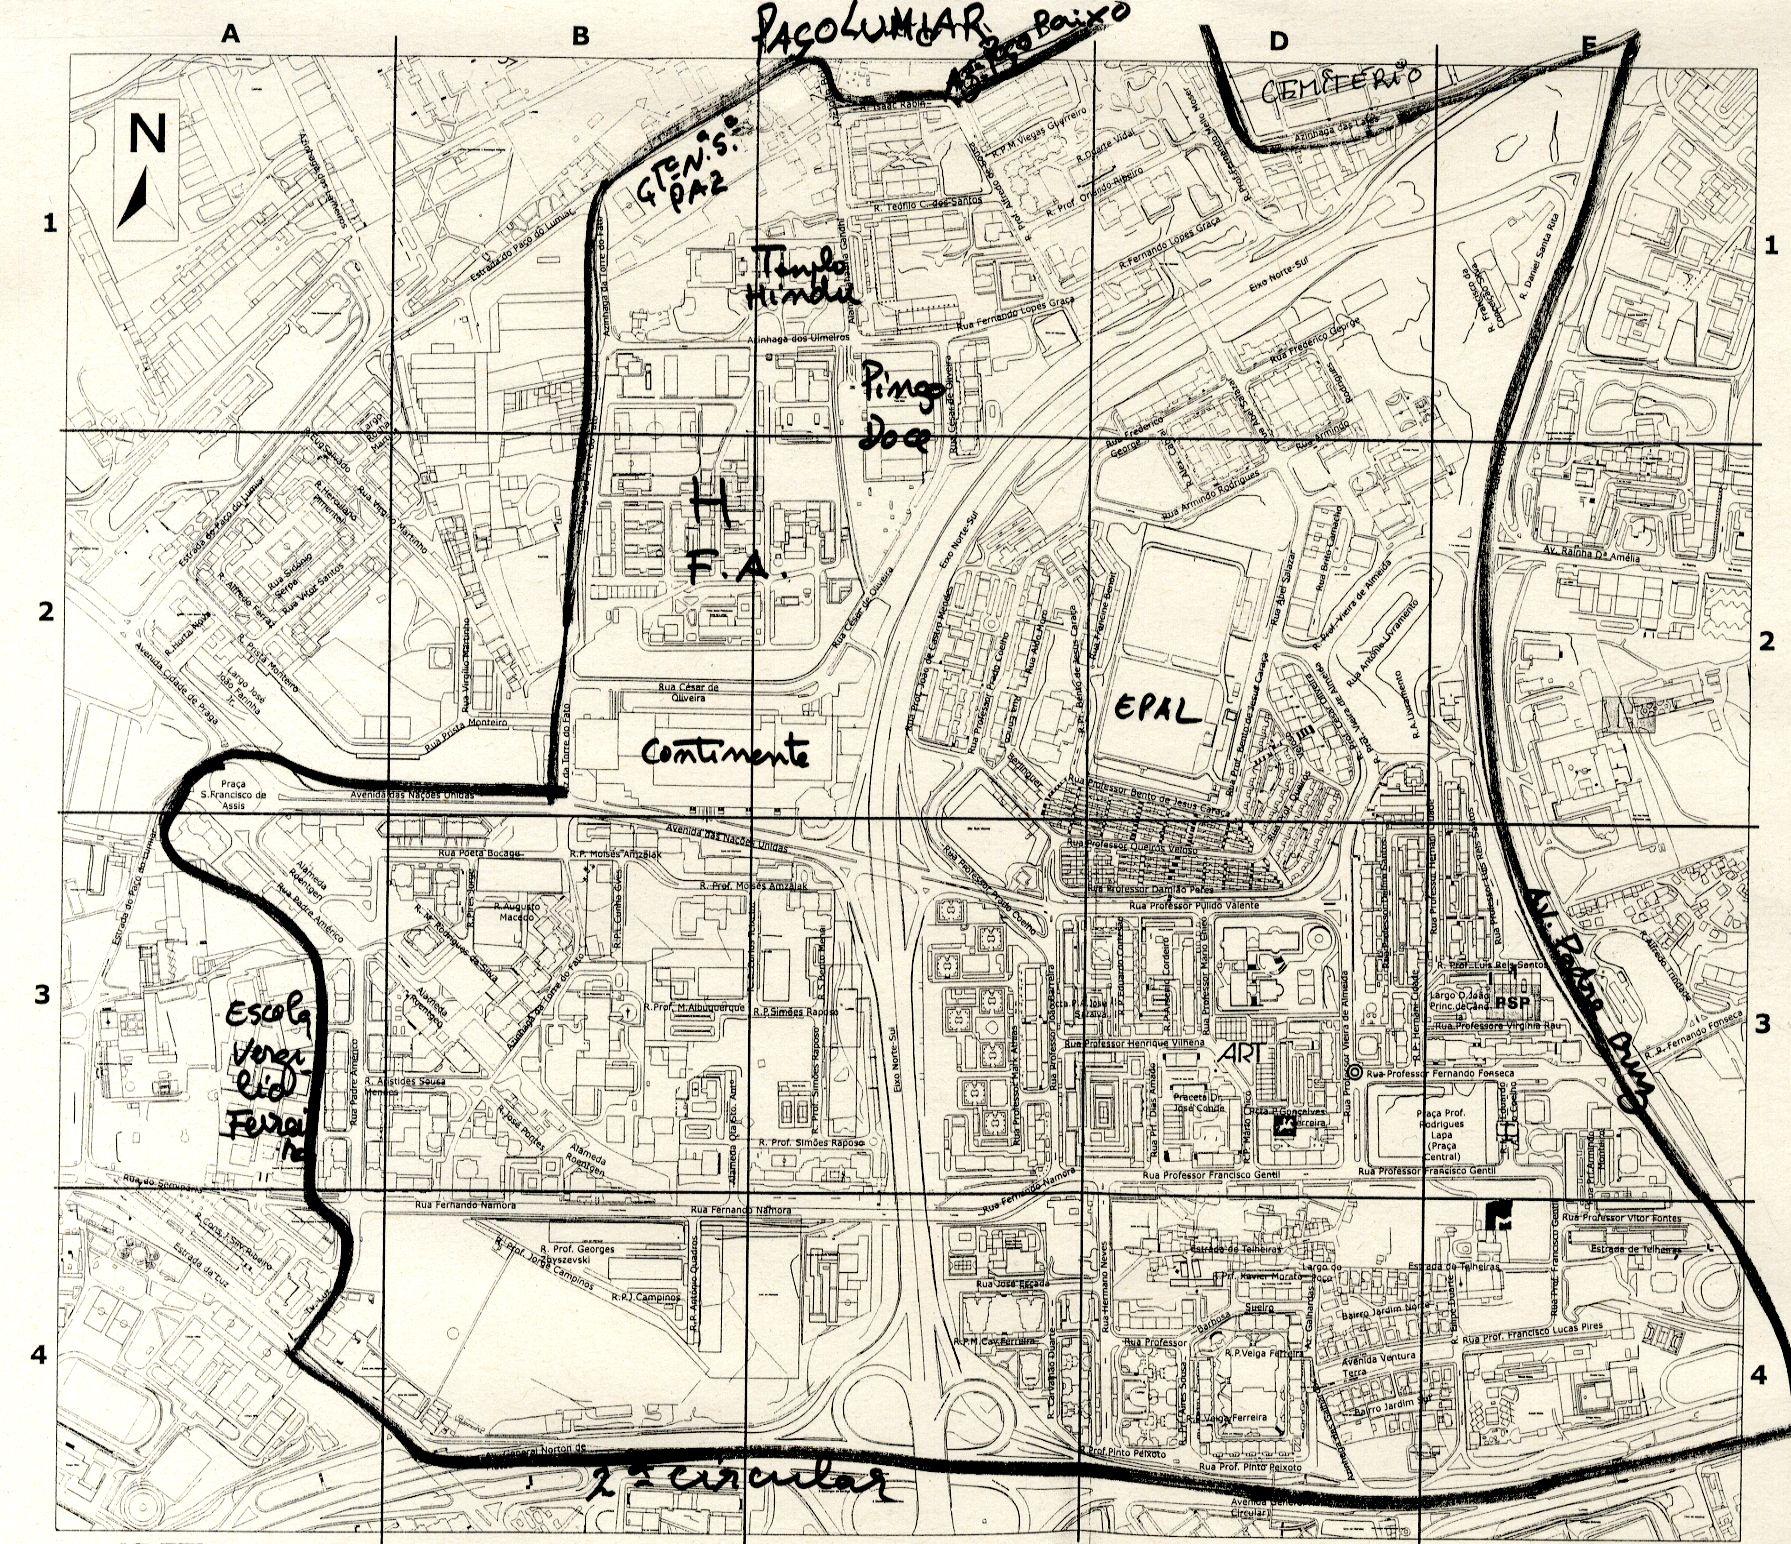 mapa telheiras Telheiras Mapa | thujamassages mapa telheiras